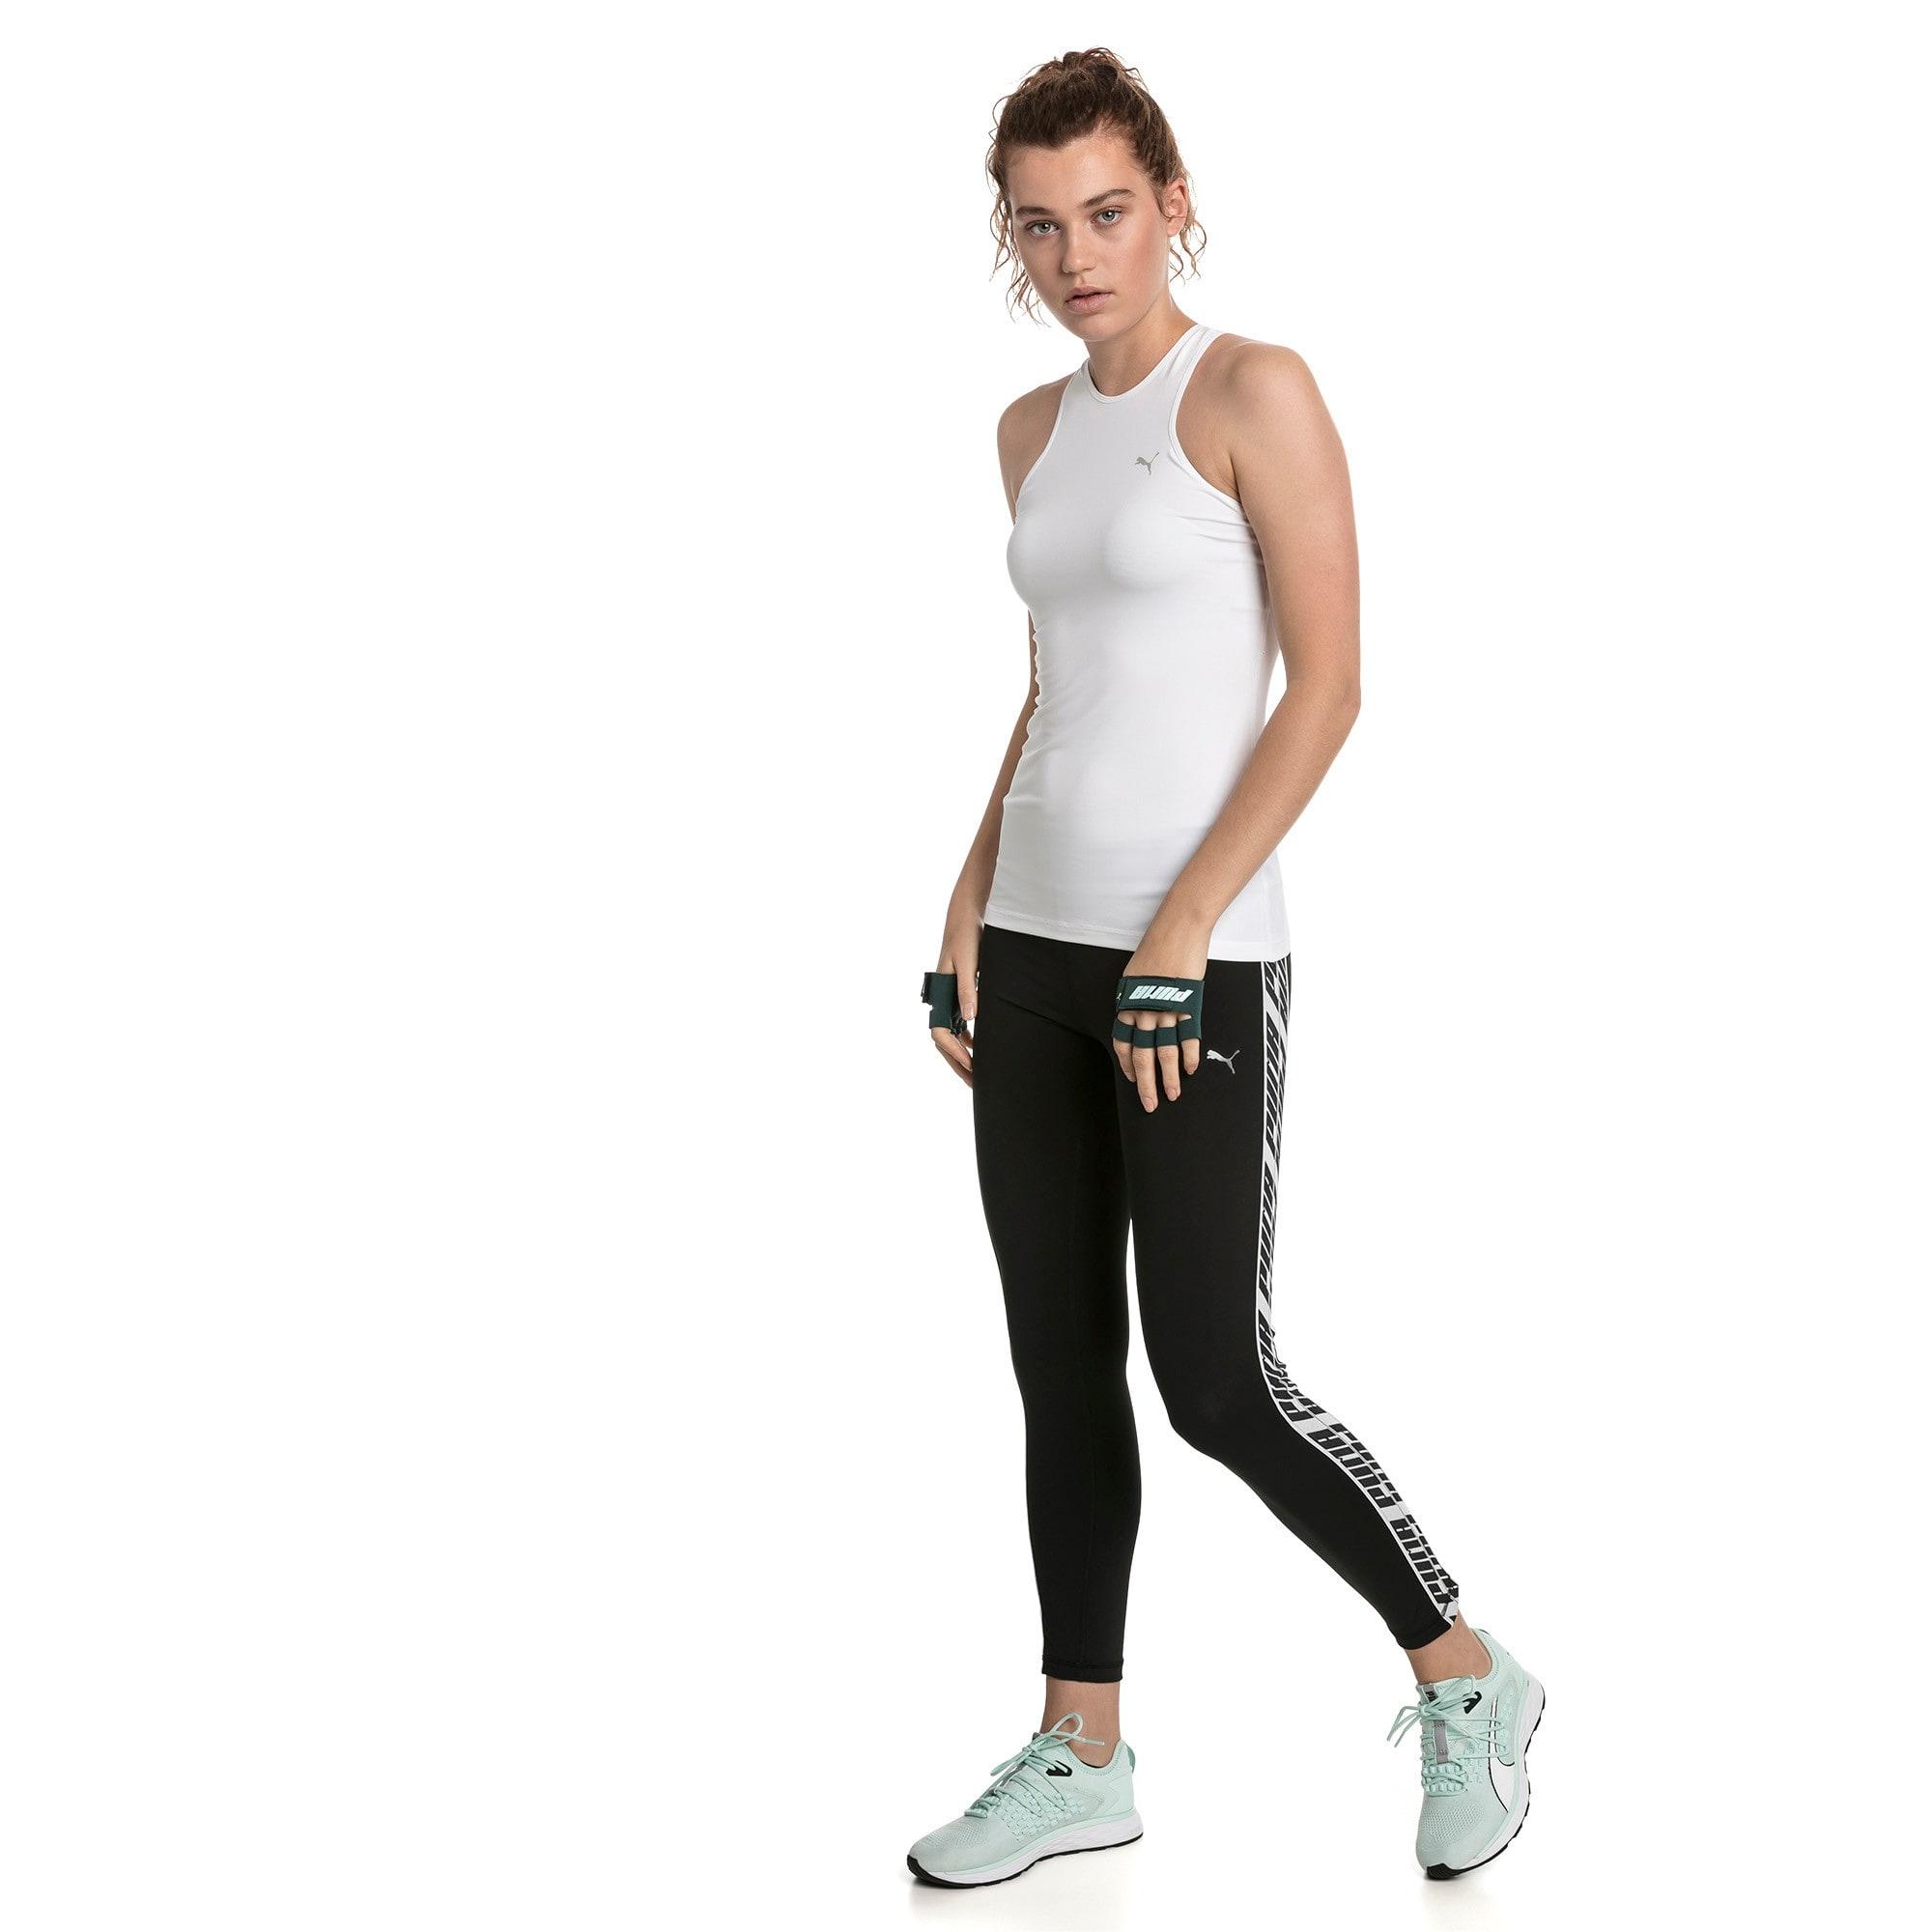 Thumbnail 3 of Feel It Women's 7/8 Leggings, Puma Black-with White tape, medium